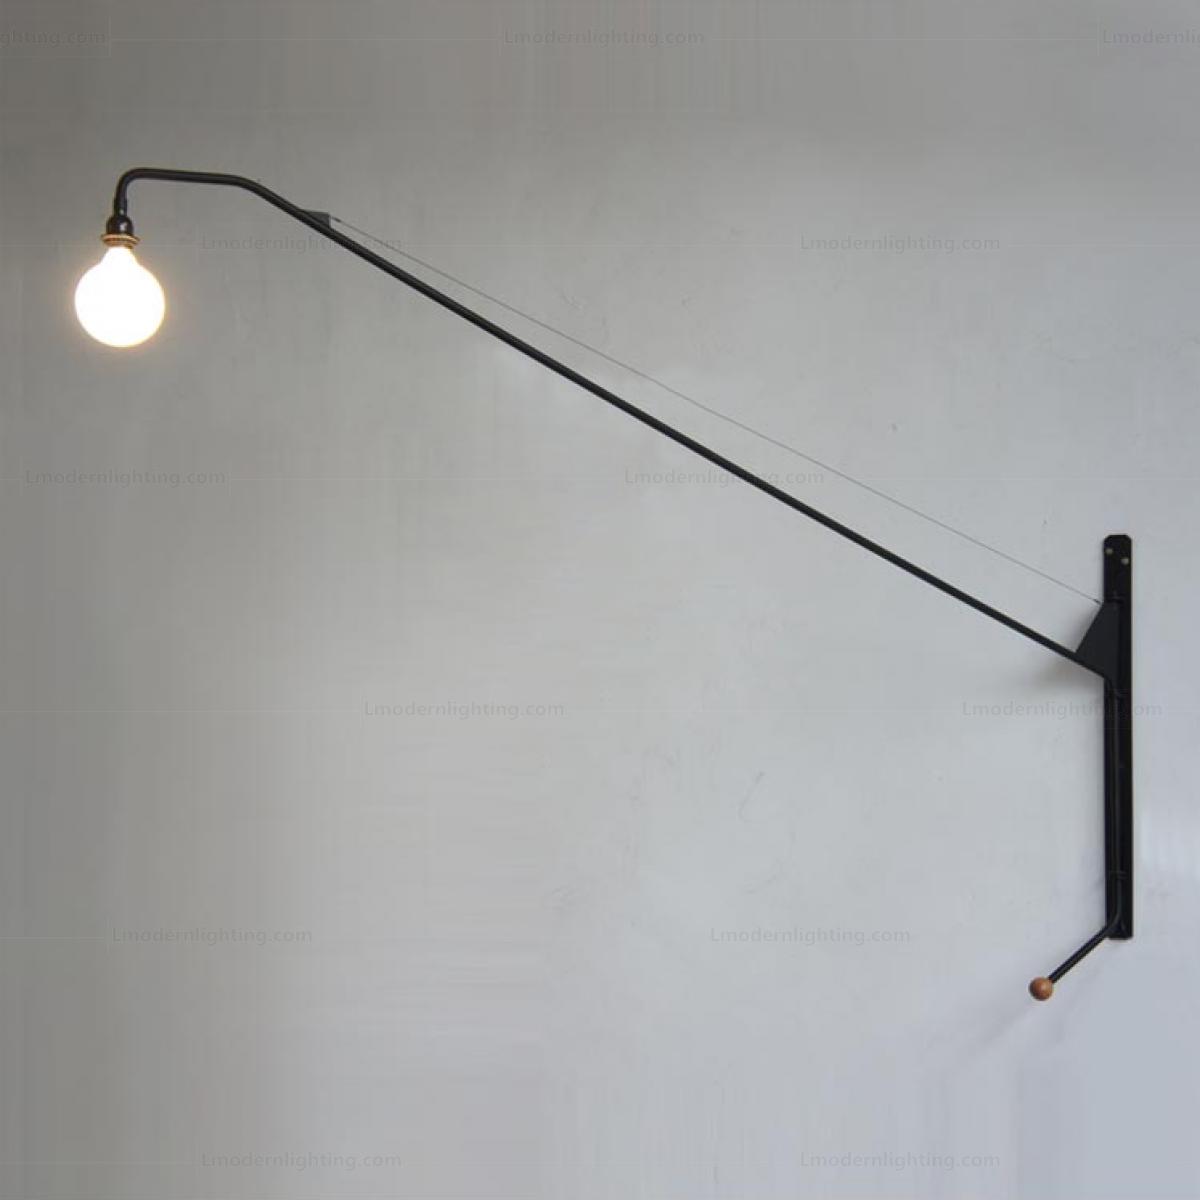 Long Pole Steel Potence Wall Light Wall Lights Wall Lamp Light